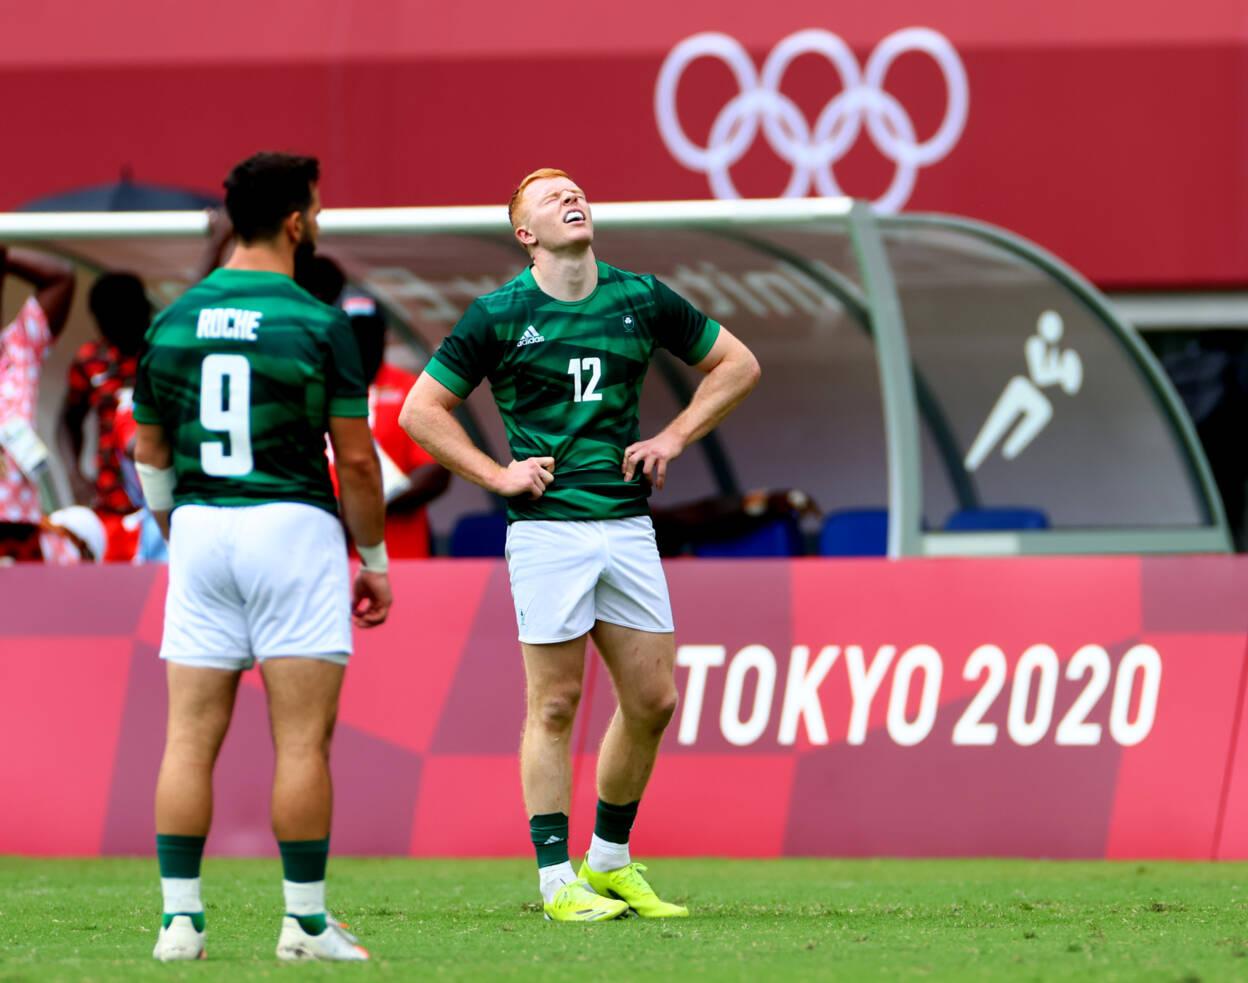 Late Heartbreak For Ireland In Pursuit Of Tokyo Quarter-Final